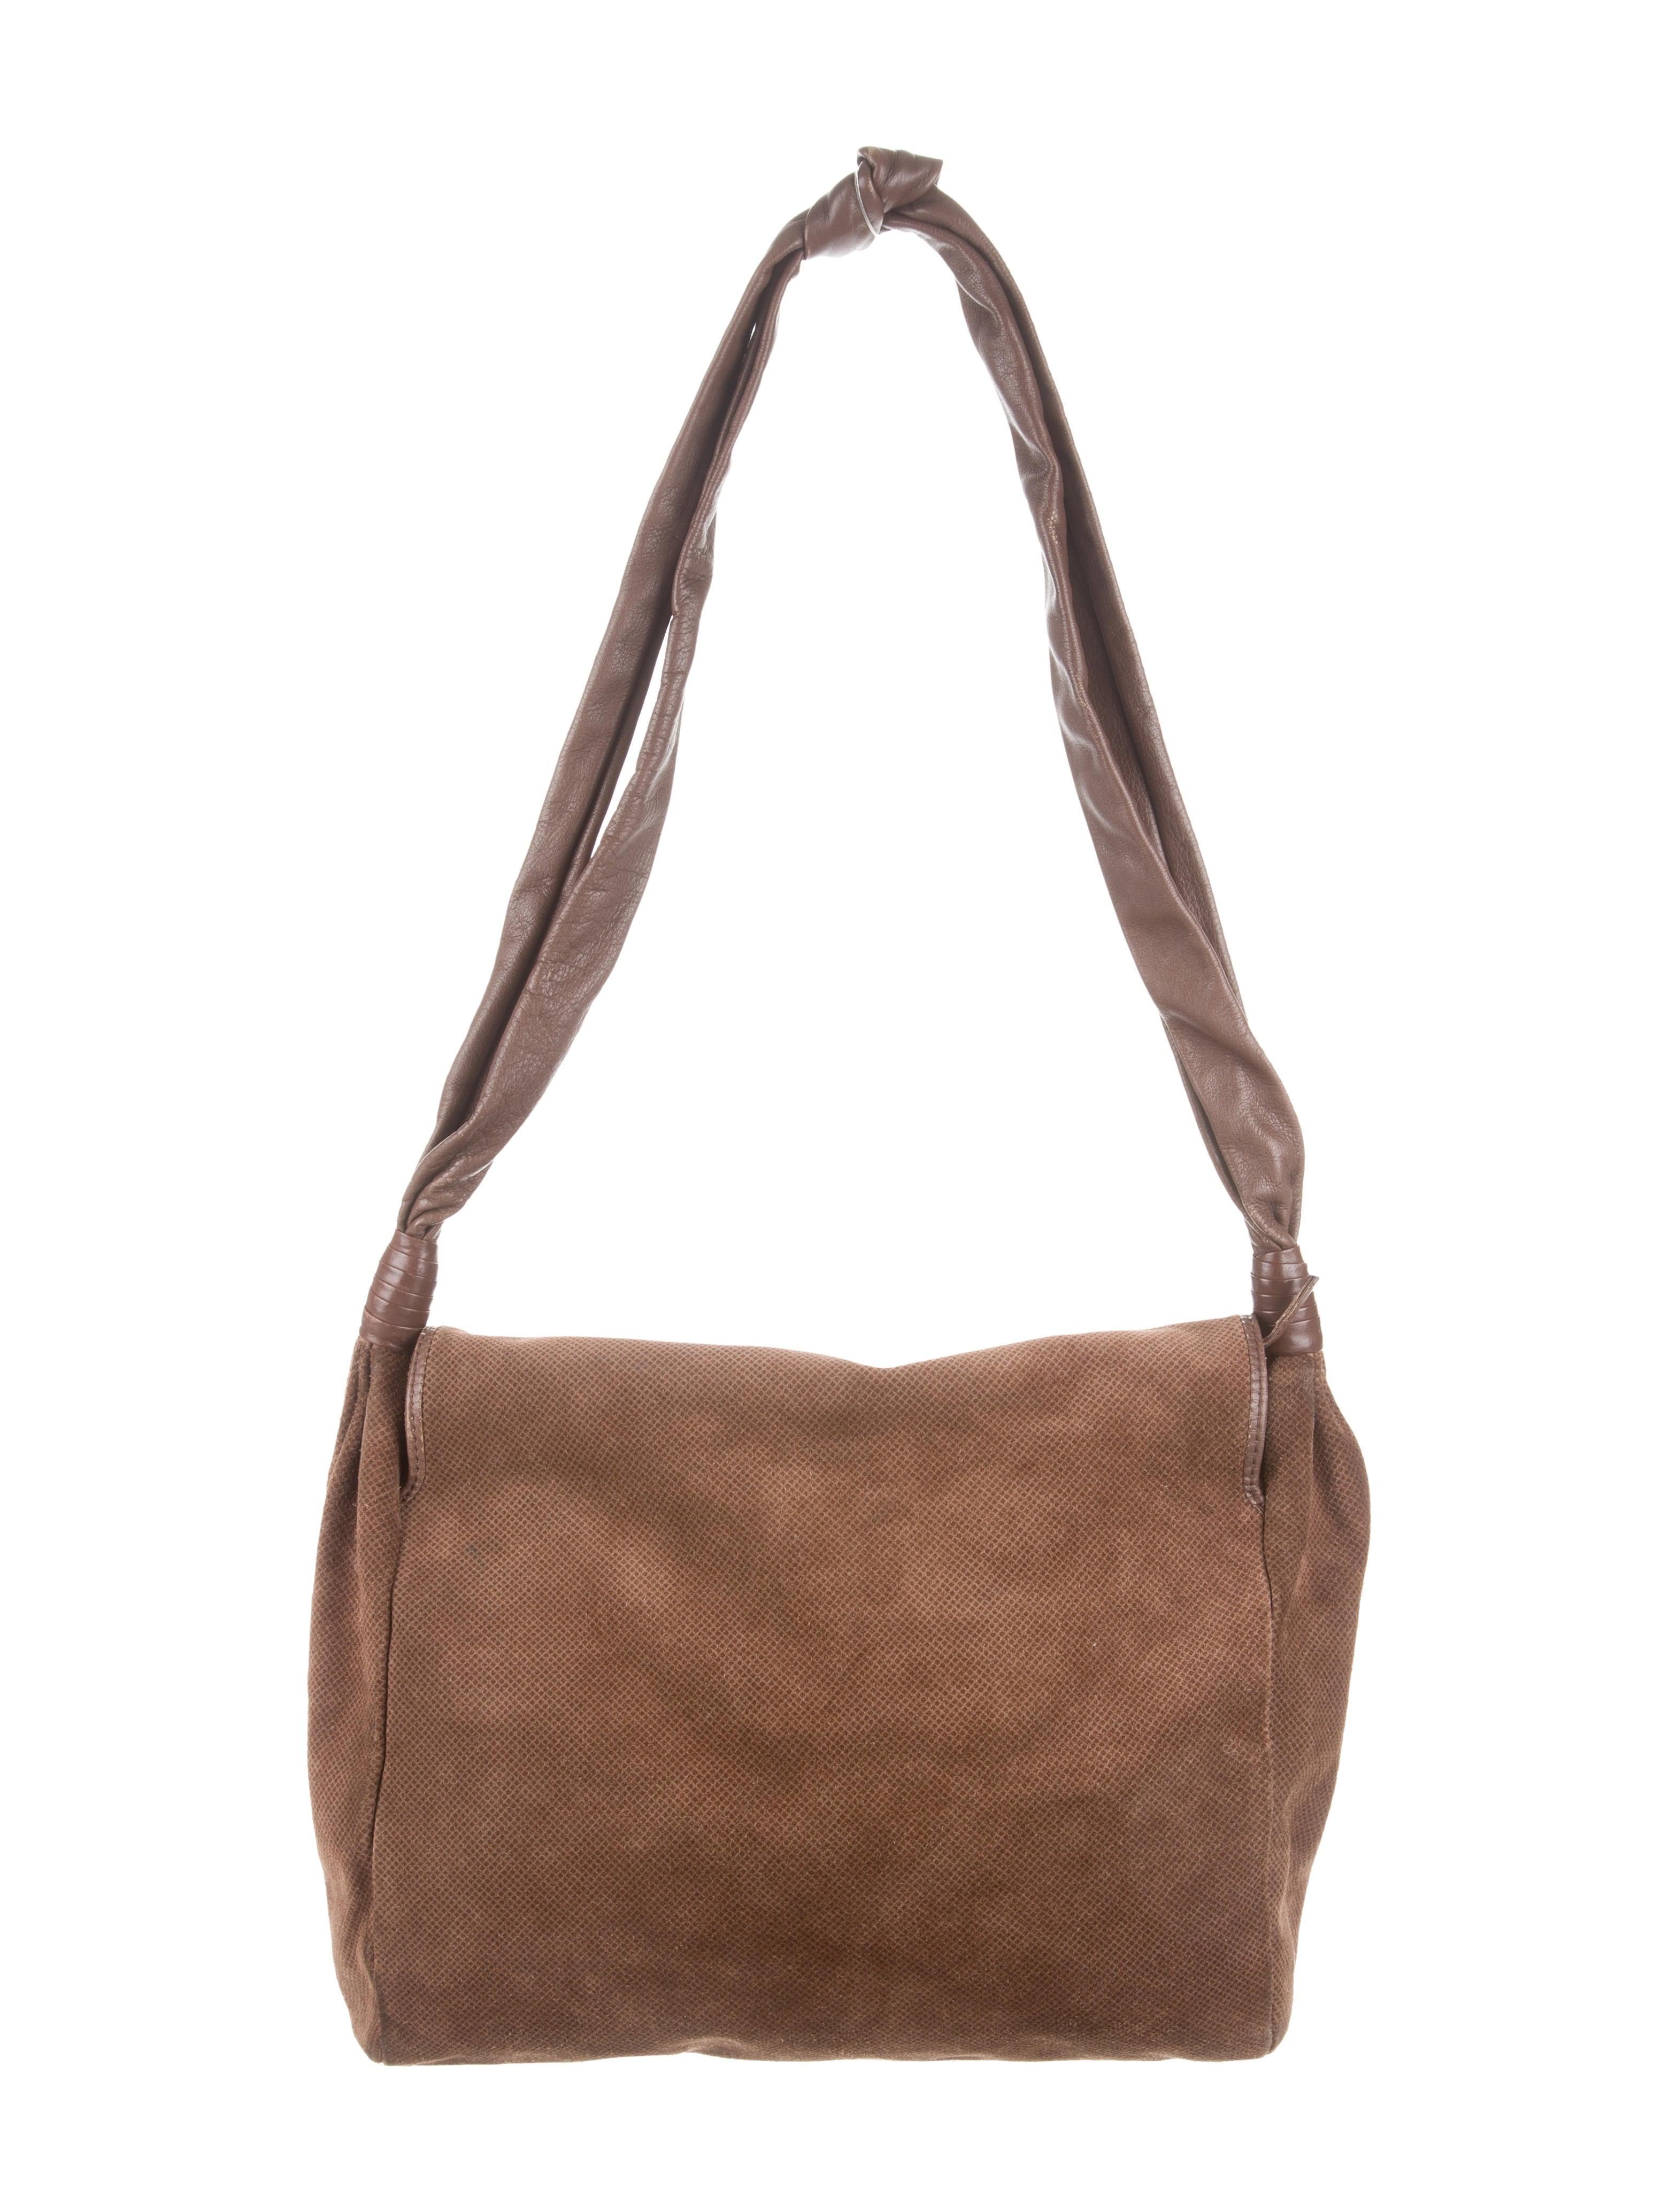 24db3b3681 MESSENGER BAG IN ATLANTIC INTRECCIATO NAPPA. Bottega Veneta Suede Messenger  Bag - Handbags - BOT29836